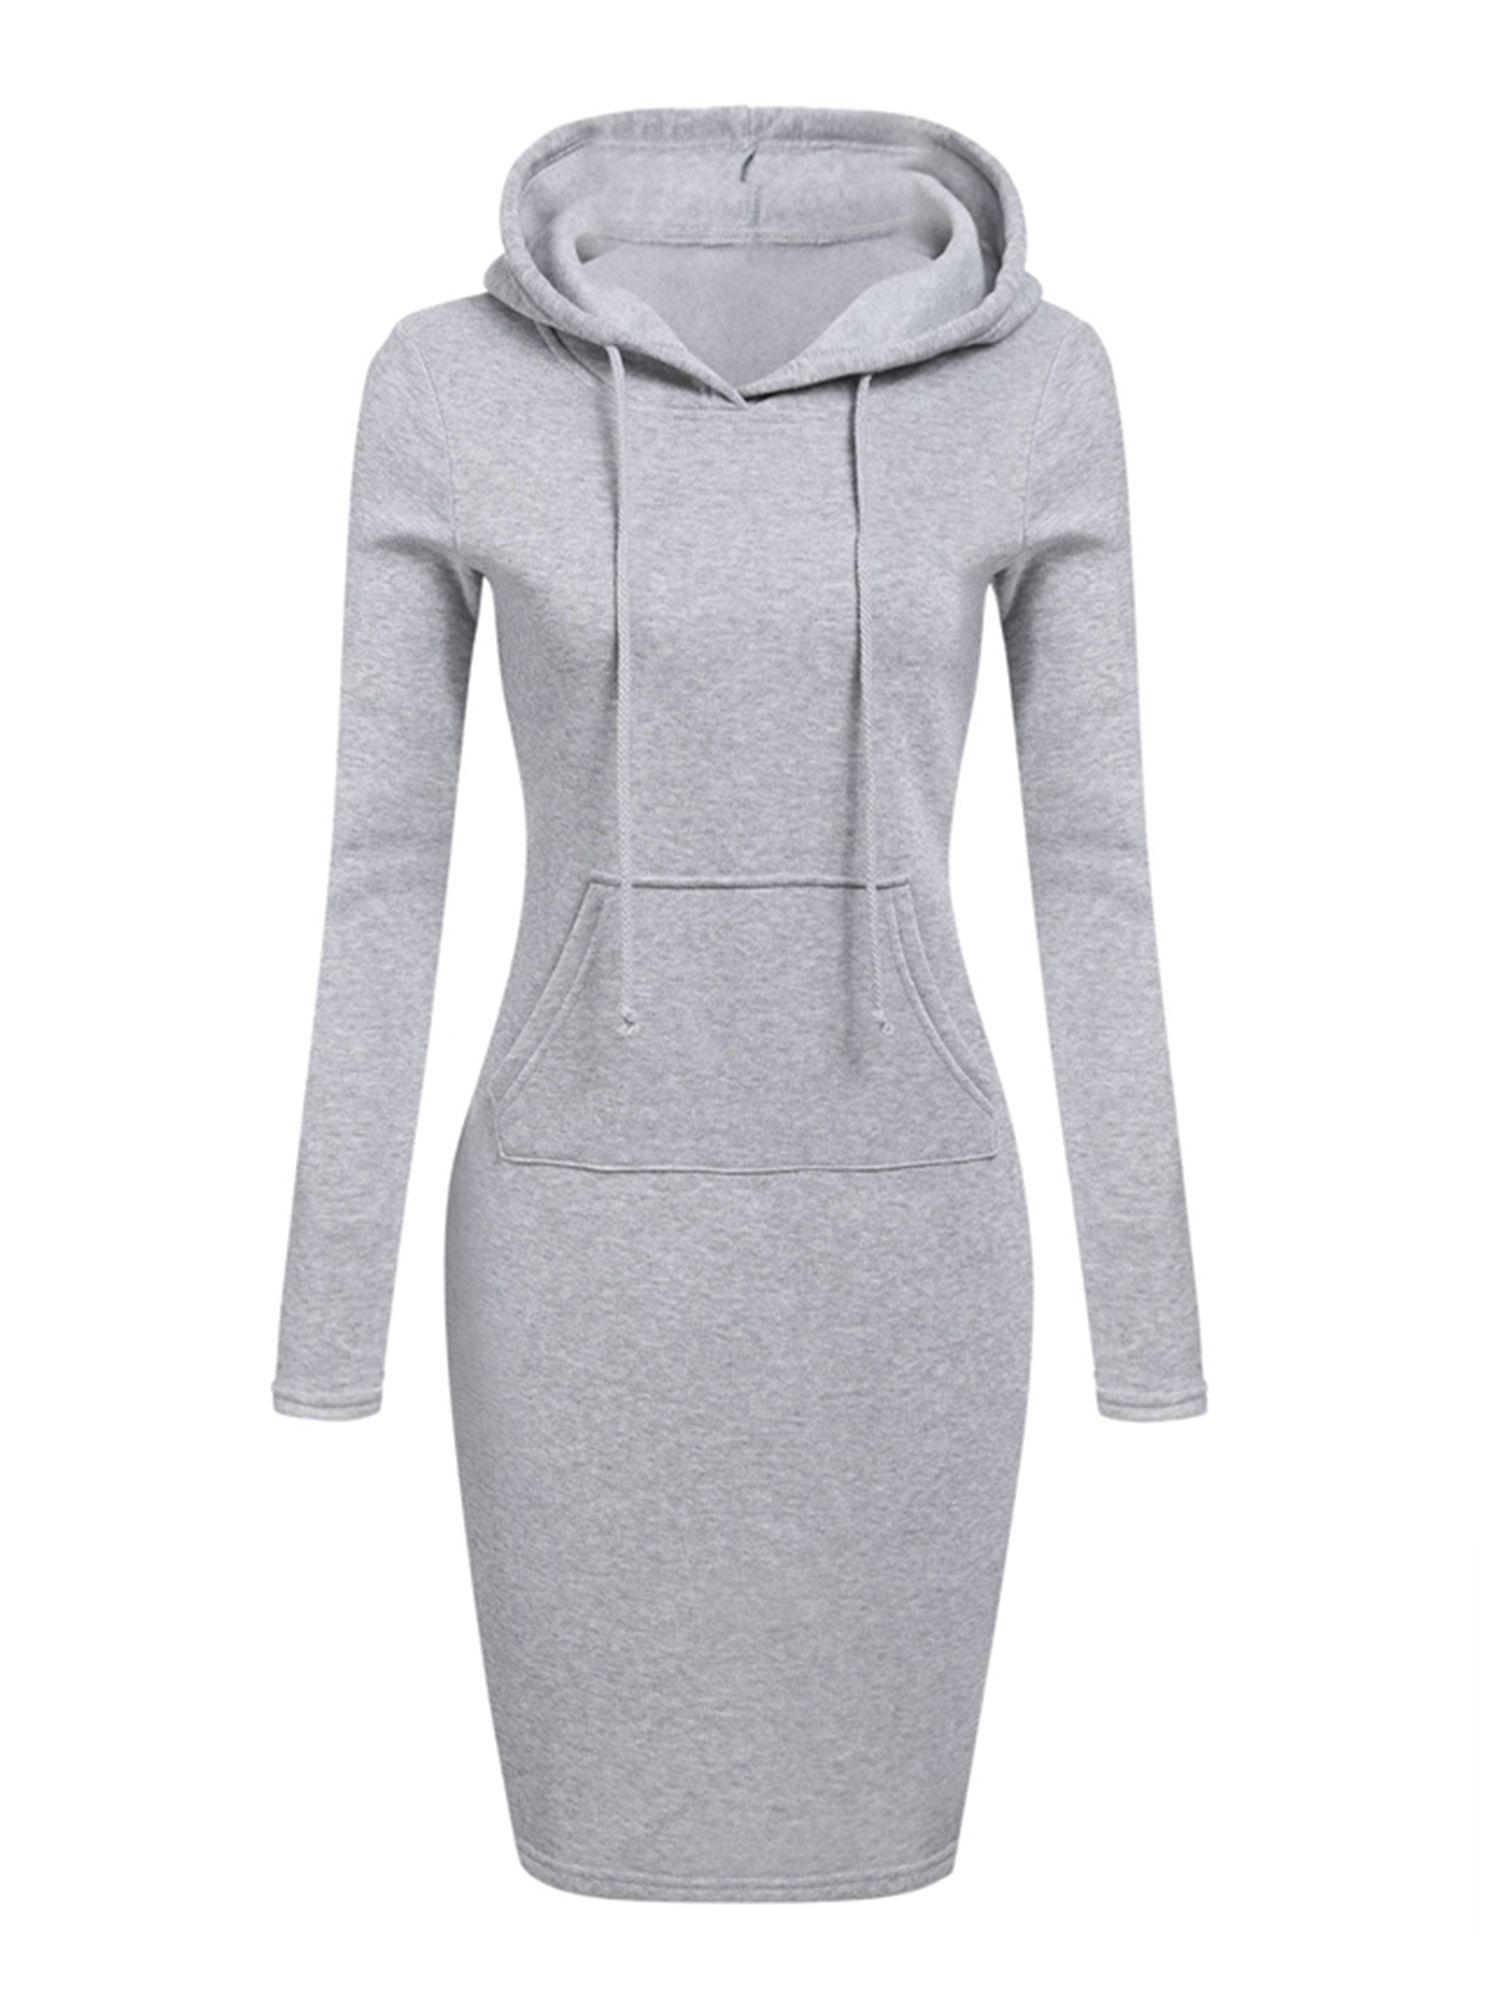 Wodstyle Womens Winter Drawstring Long Sleeve Slim Hoodie Dress Walmart Com Womens Sweatshirt Dress Women Long Sleeve Dress Women Hoodies Sweatshirts [ 2000 x 1500 Pixel ]